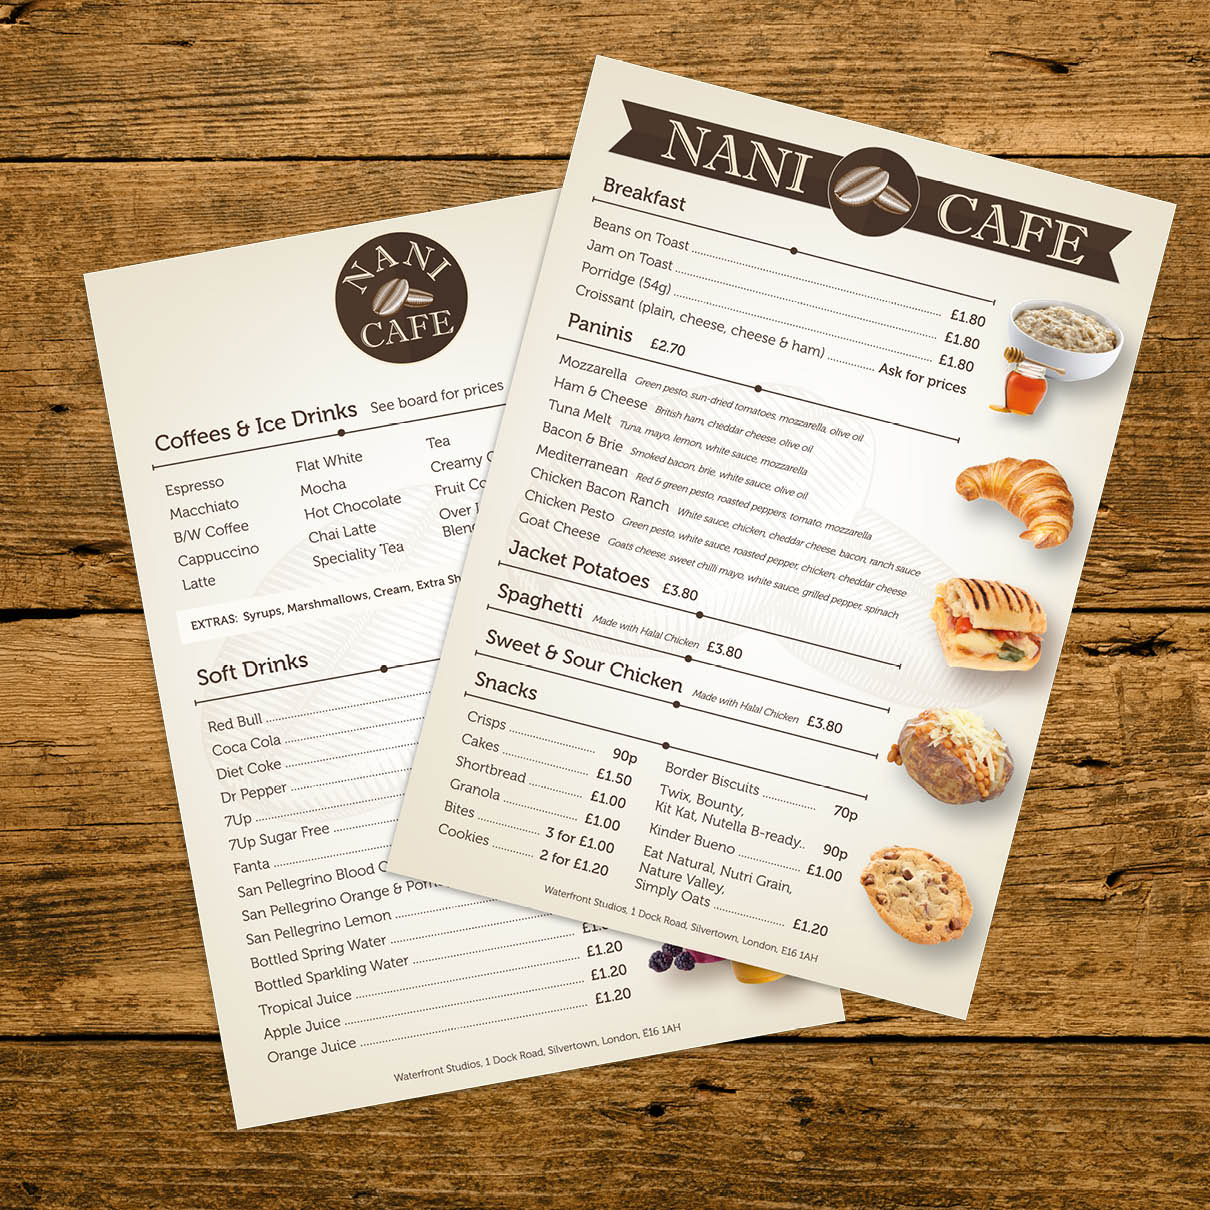 Nani-Cafe-Menu-FLAT